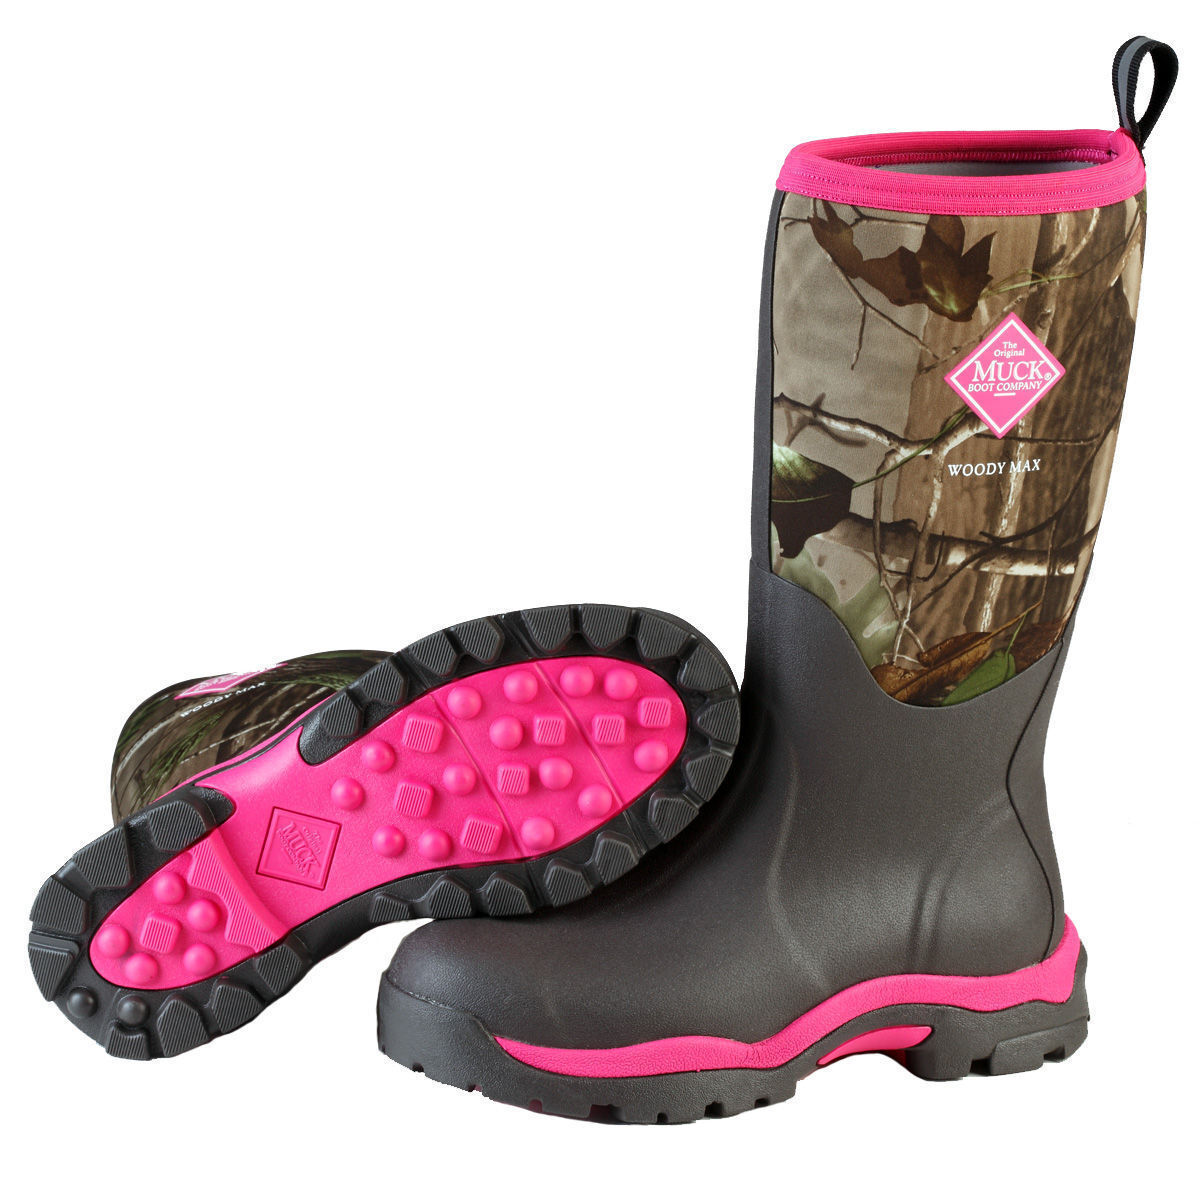 Muck wwpk-RAPG Woody PK PINK CAMO WOMEN/'S BOOTS Hunt taille Sz 6,7,8,9 New